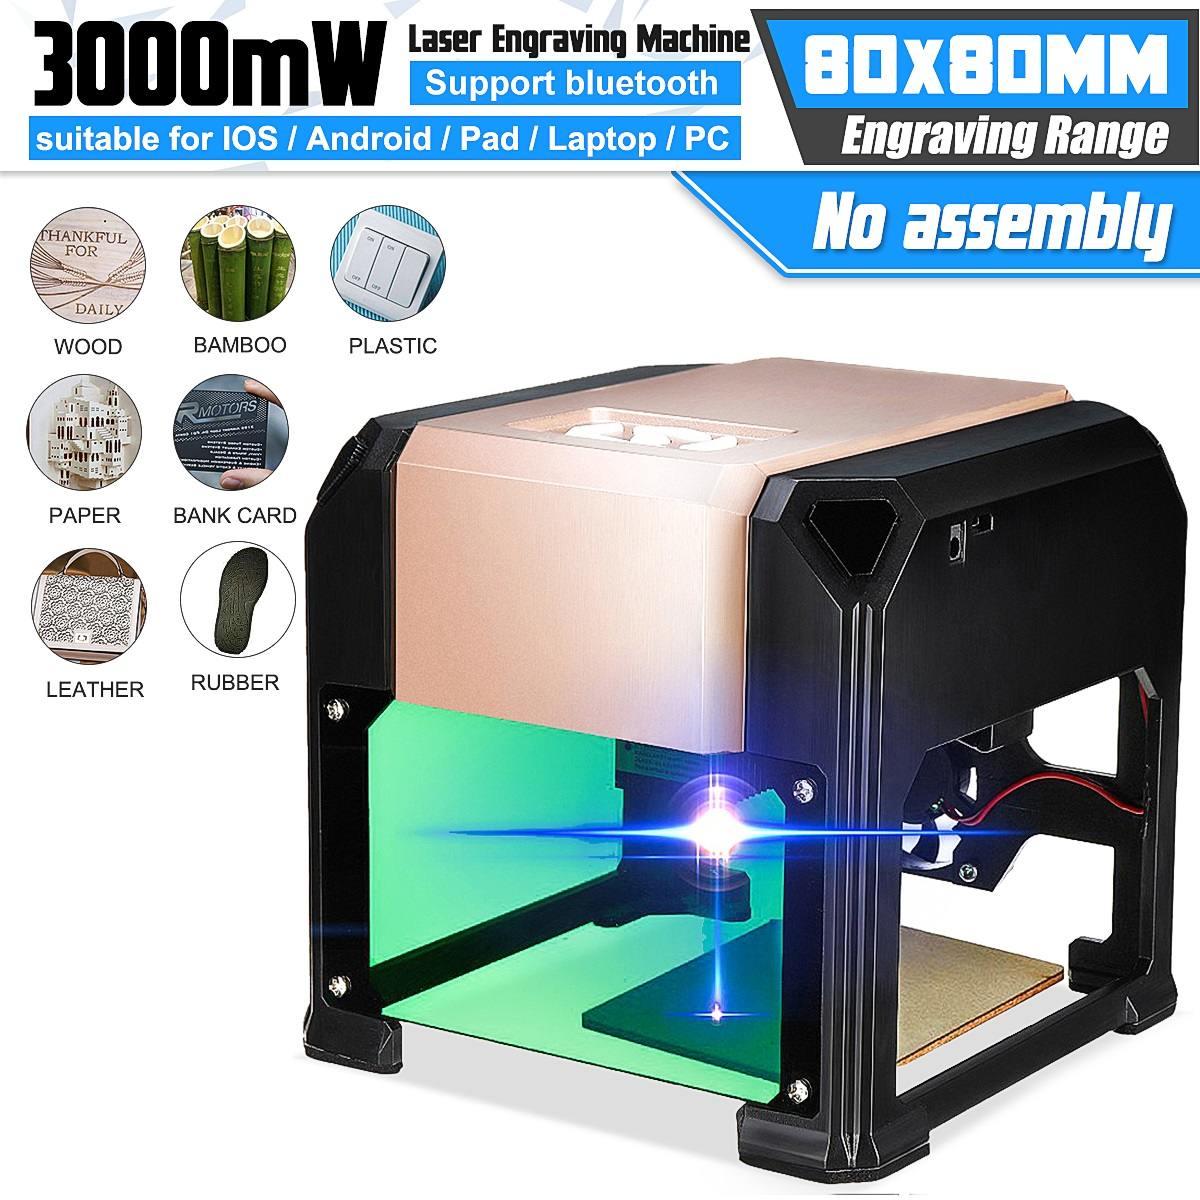 New Upgrade Bluetooth 3000MW Golden CNC Laser Engraving Machine AC 110-220V DIY Engraver Desktop Wood Router/Cutter/Printer